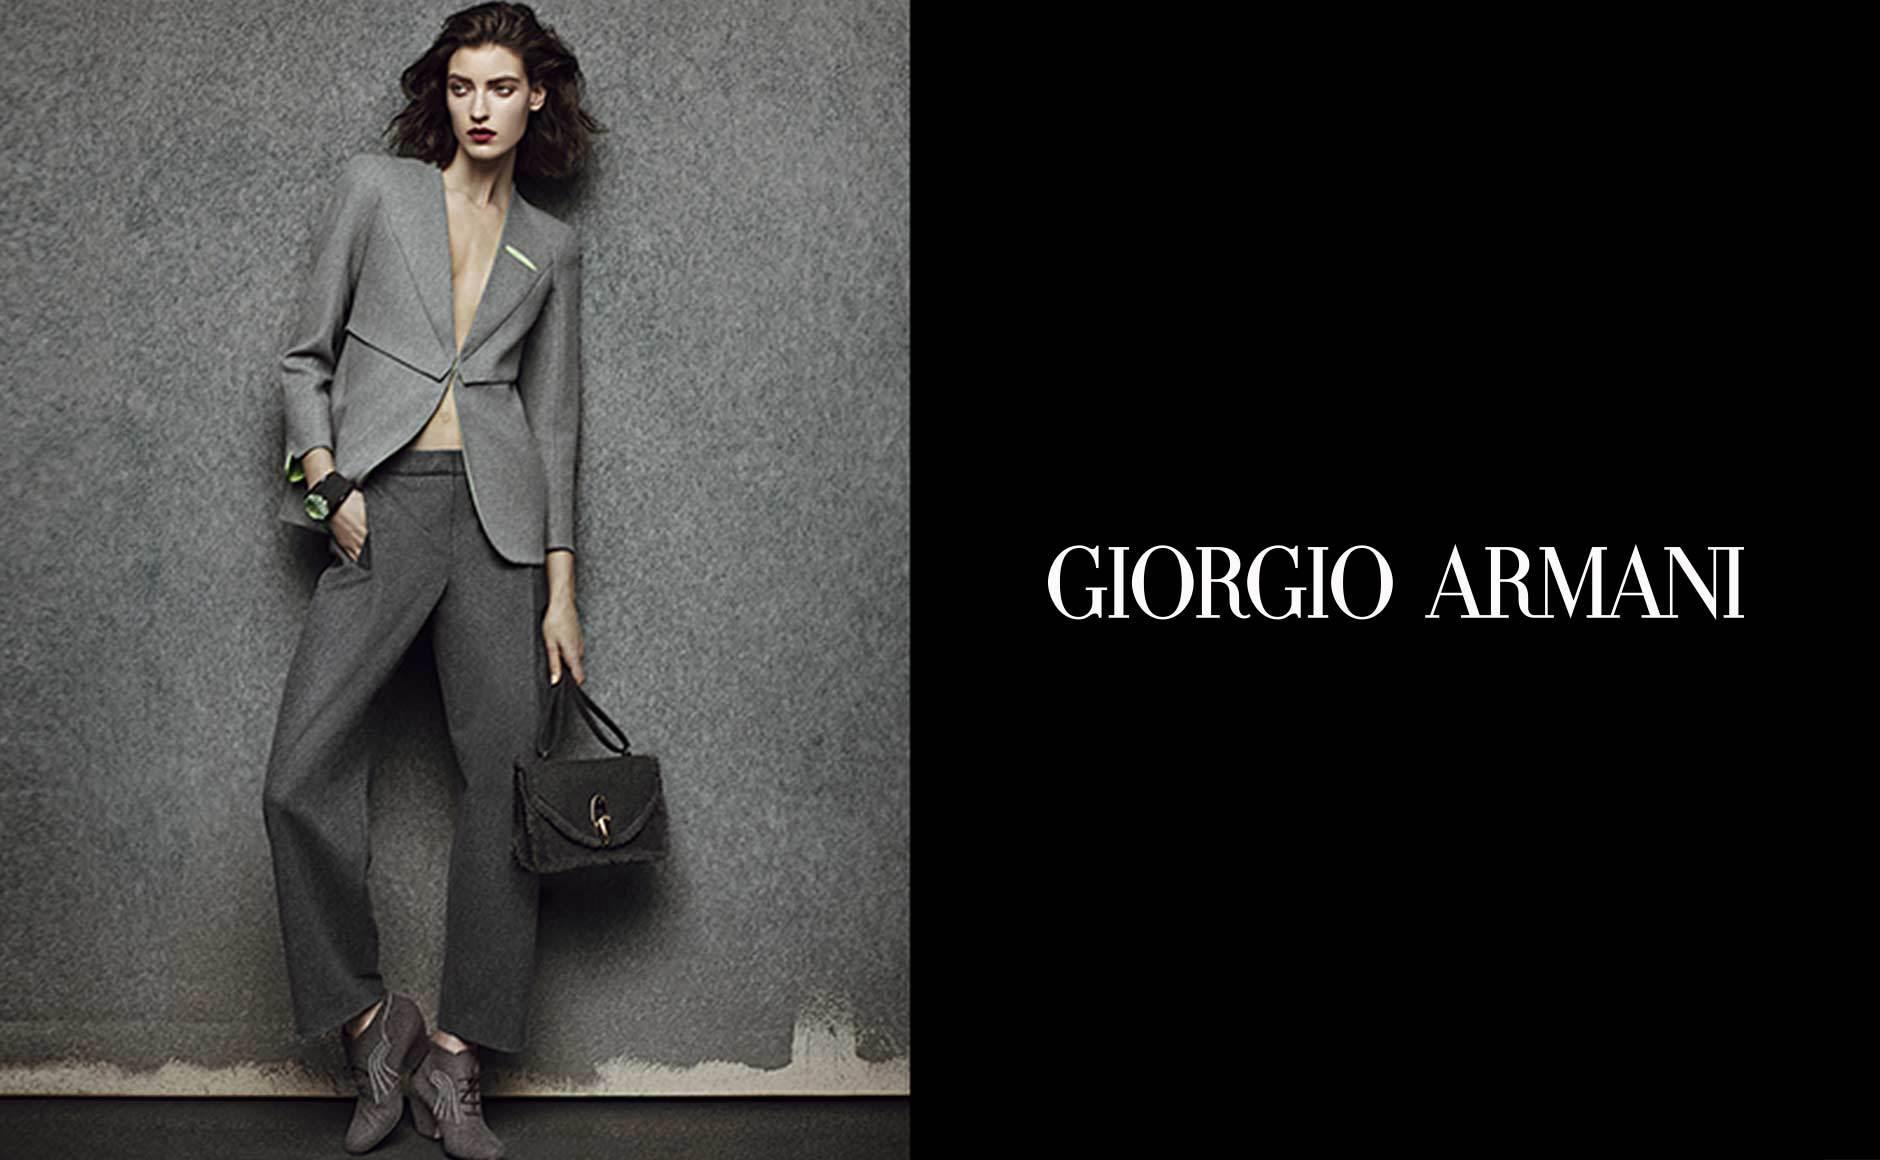 giorgio armani fashion clothing wallpapers and images